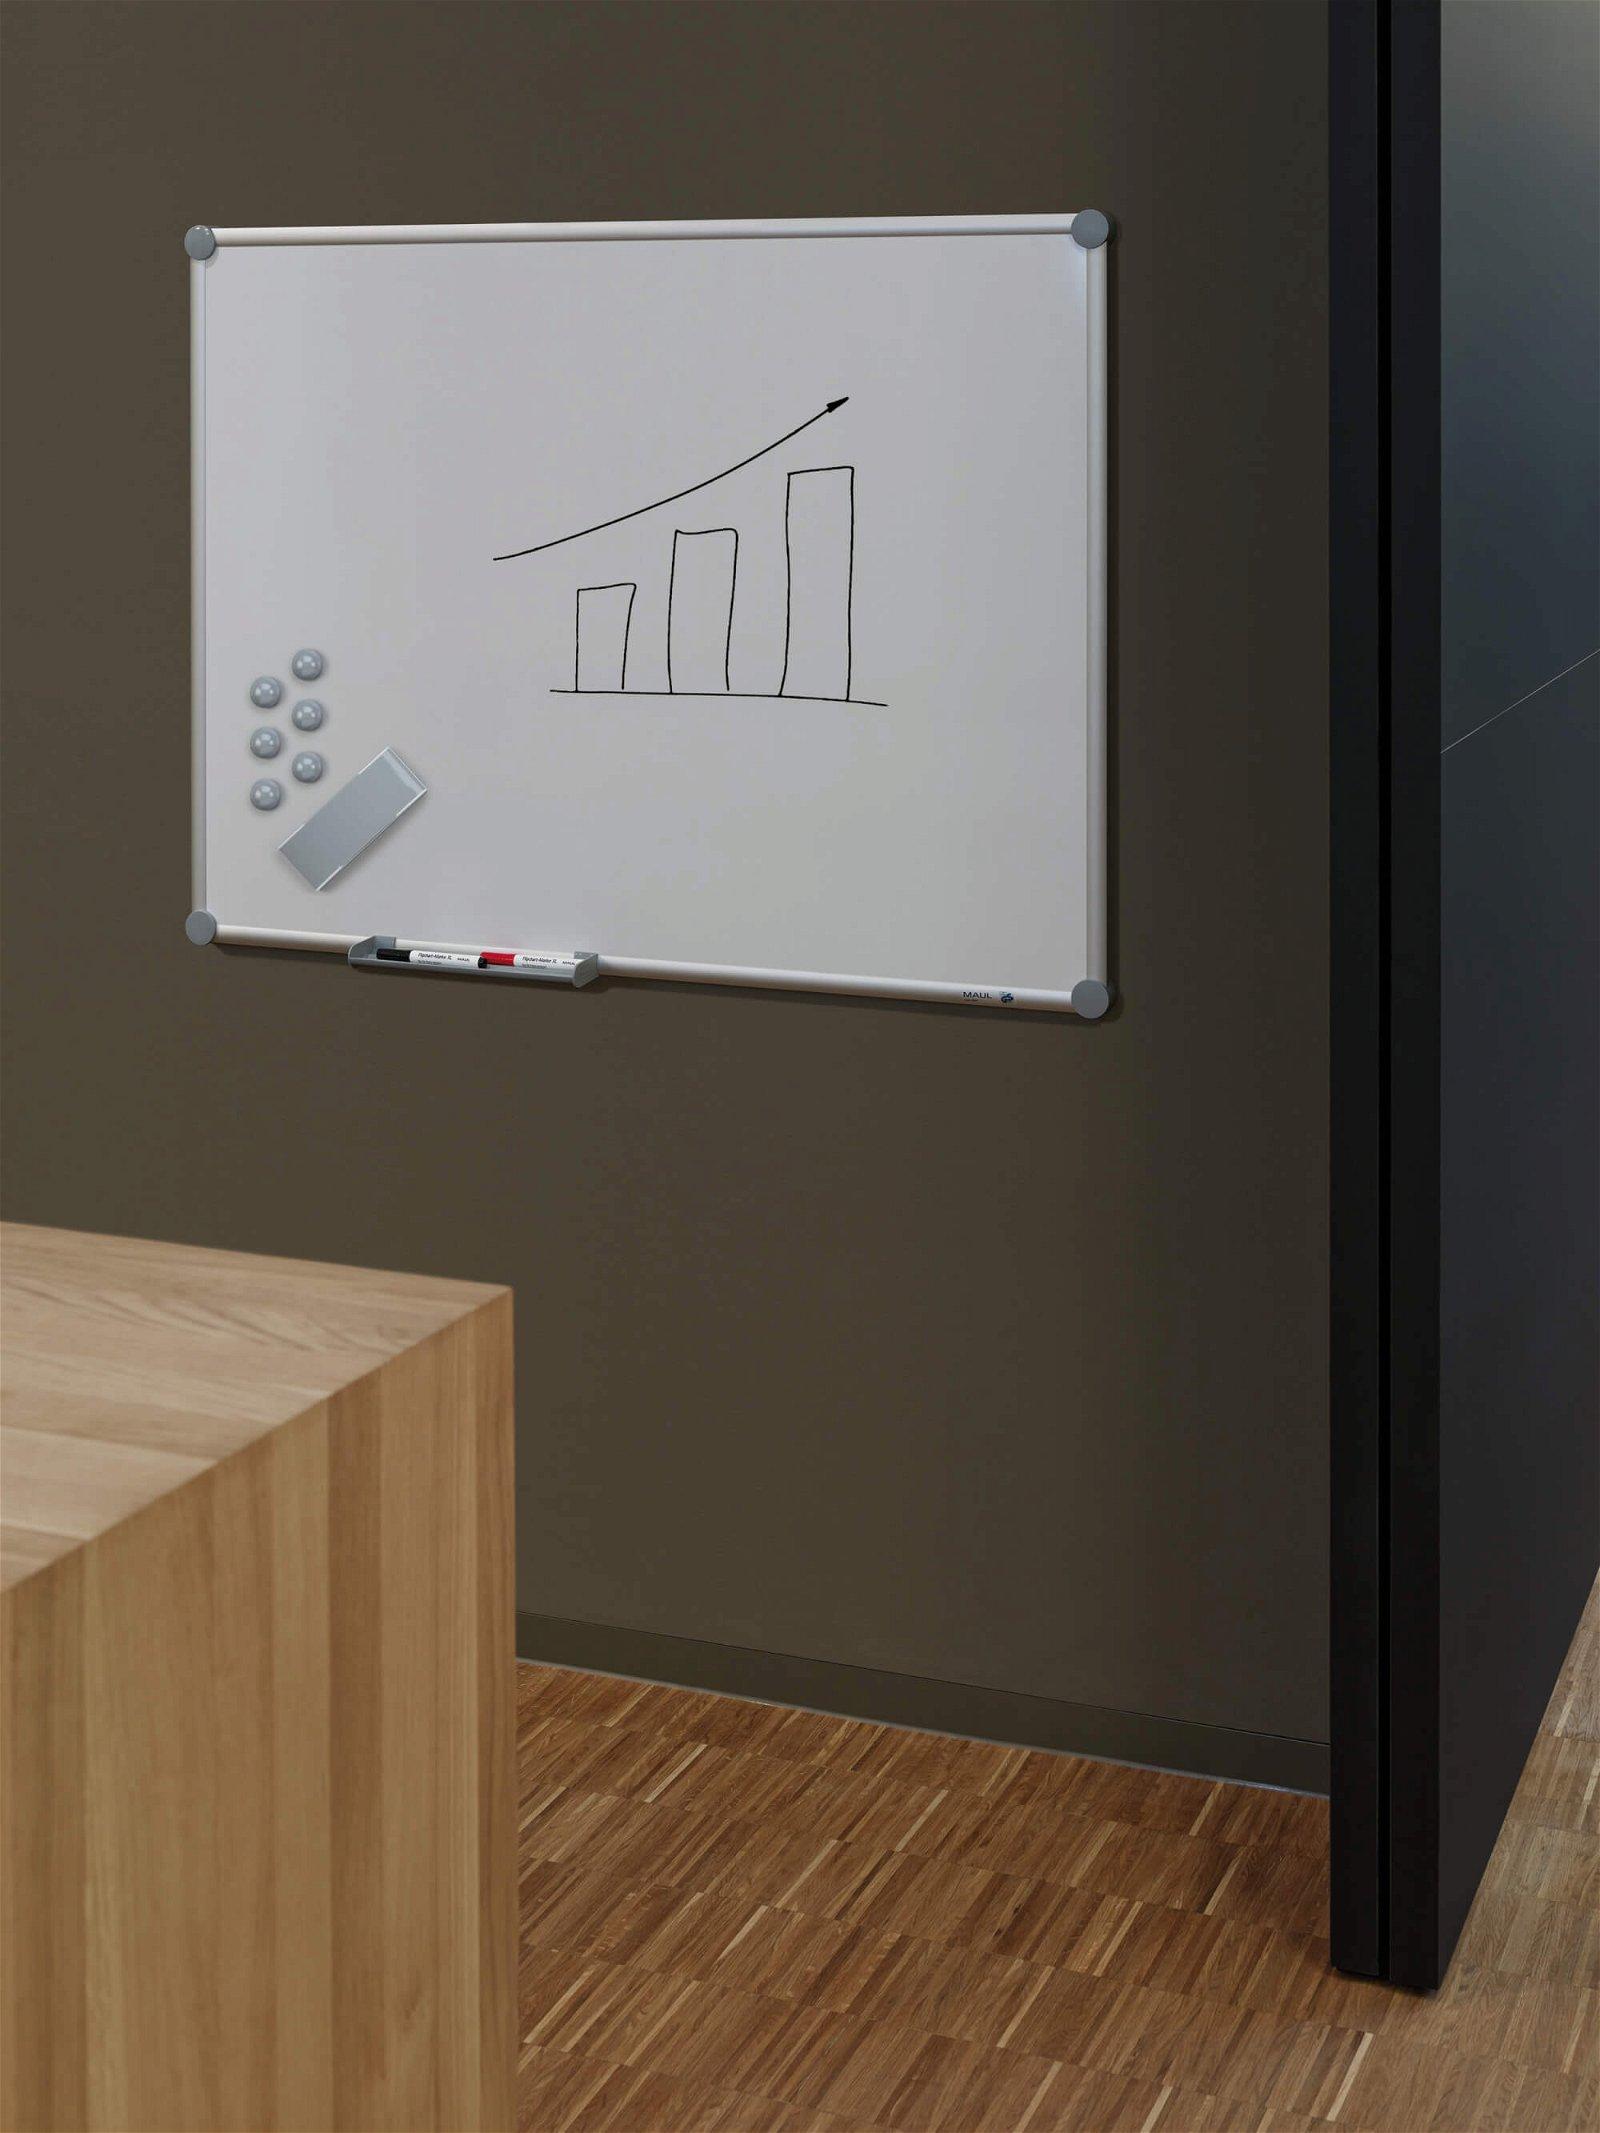 Whiteboard 2000 MAULpro, 60x90 cm, grau